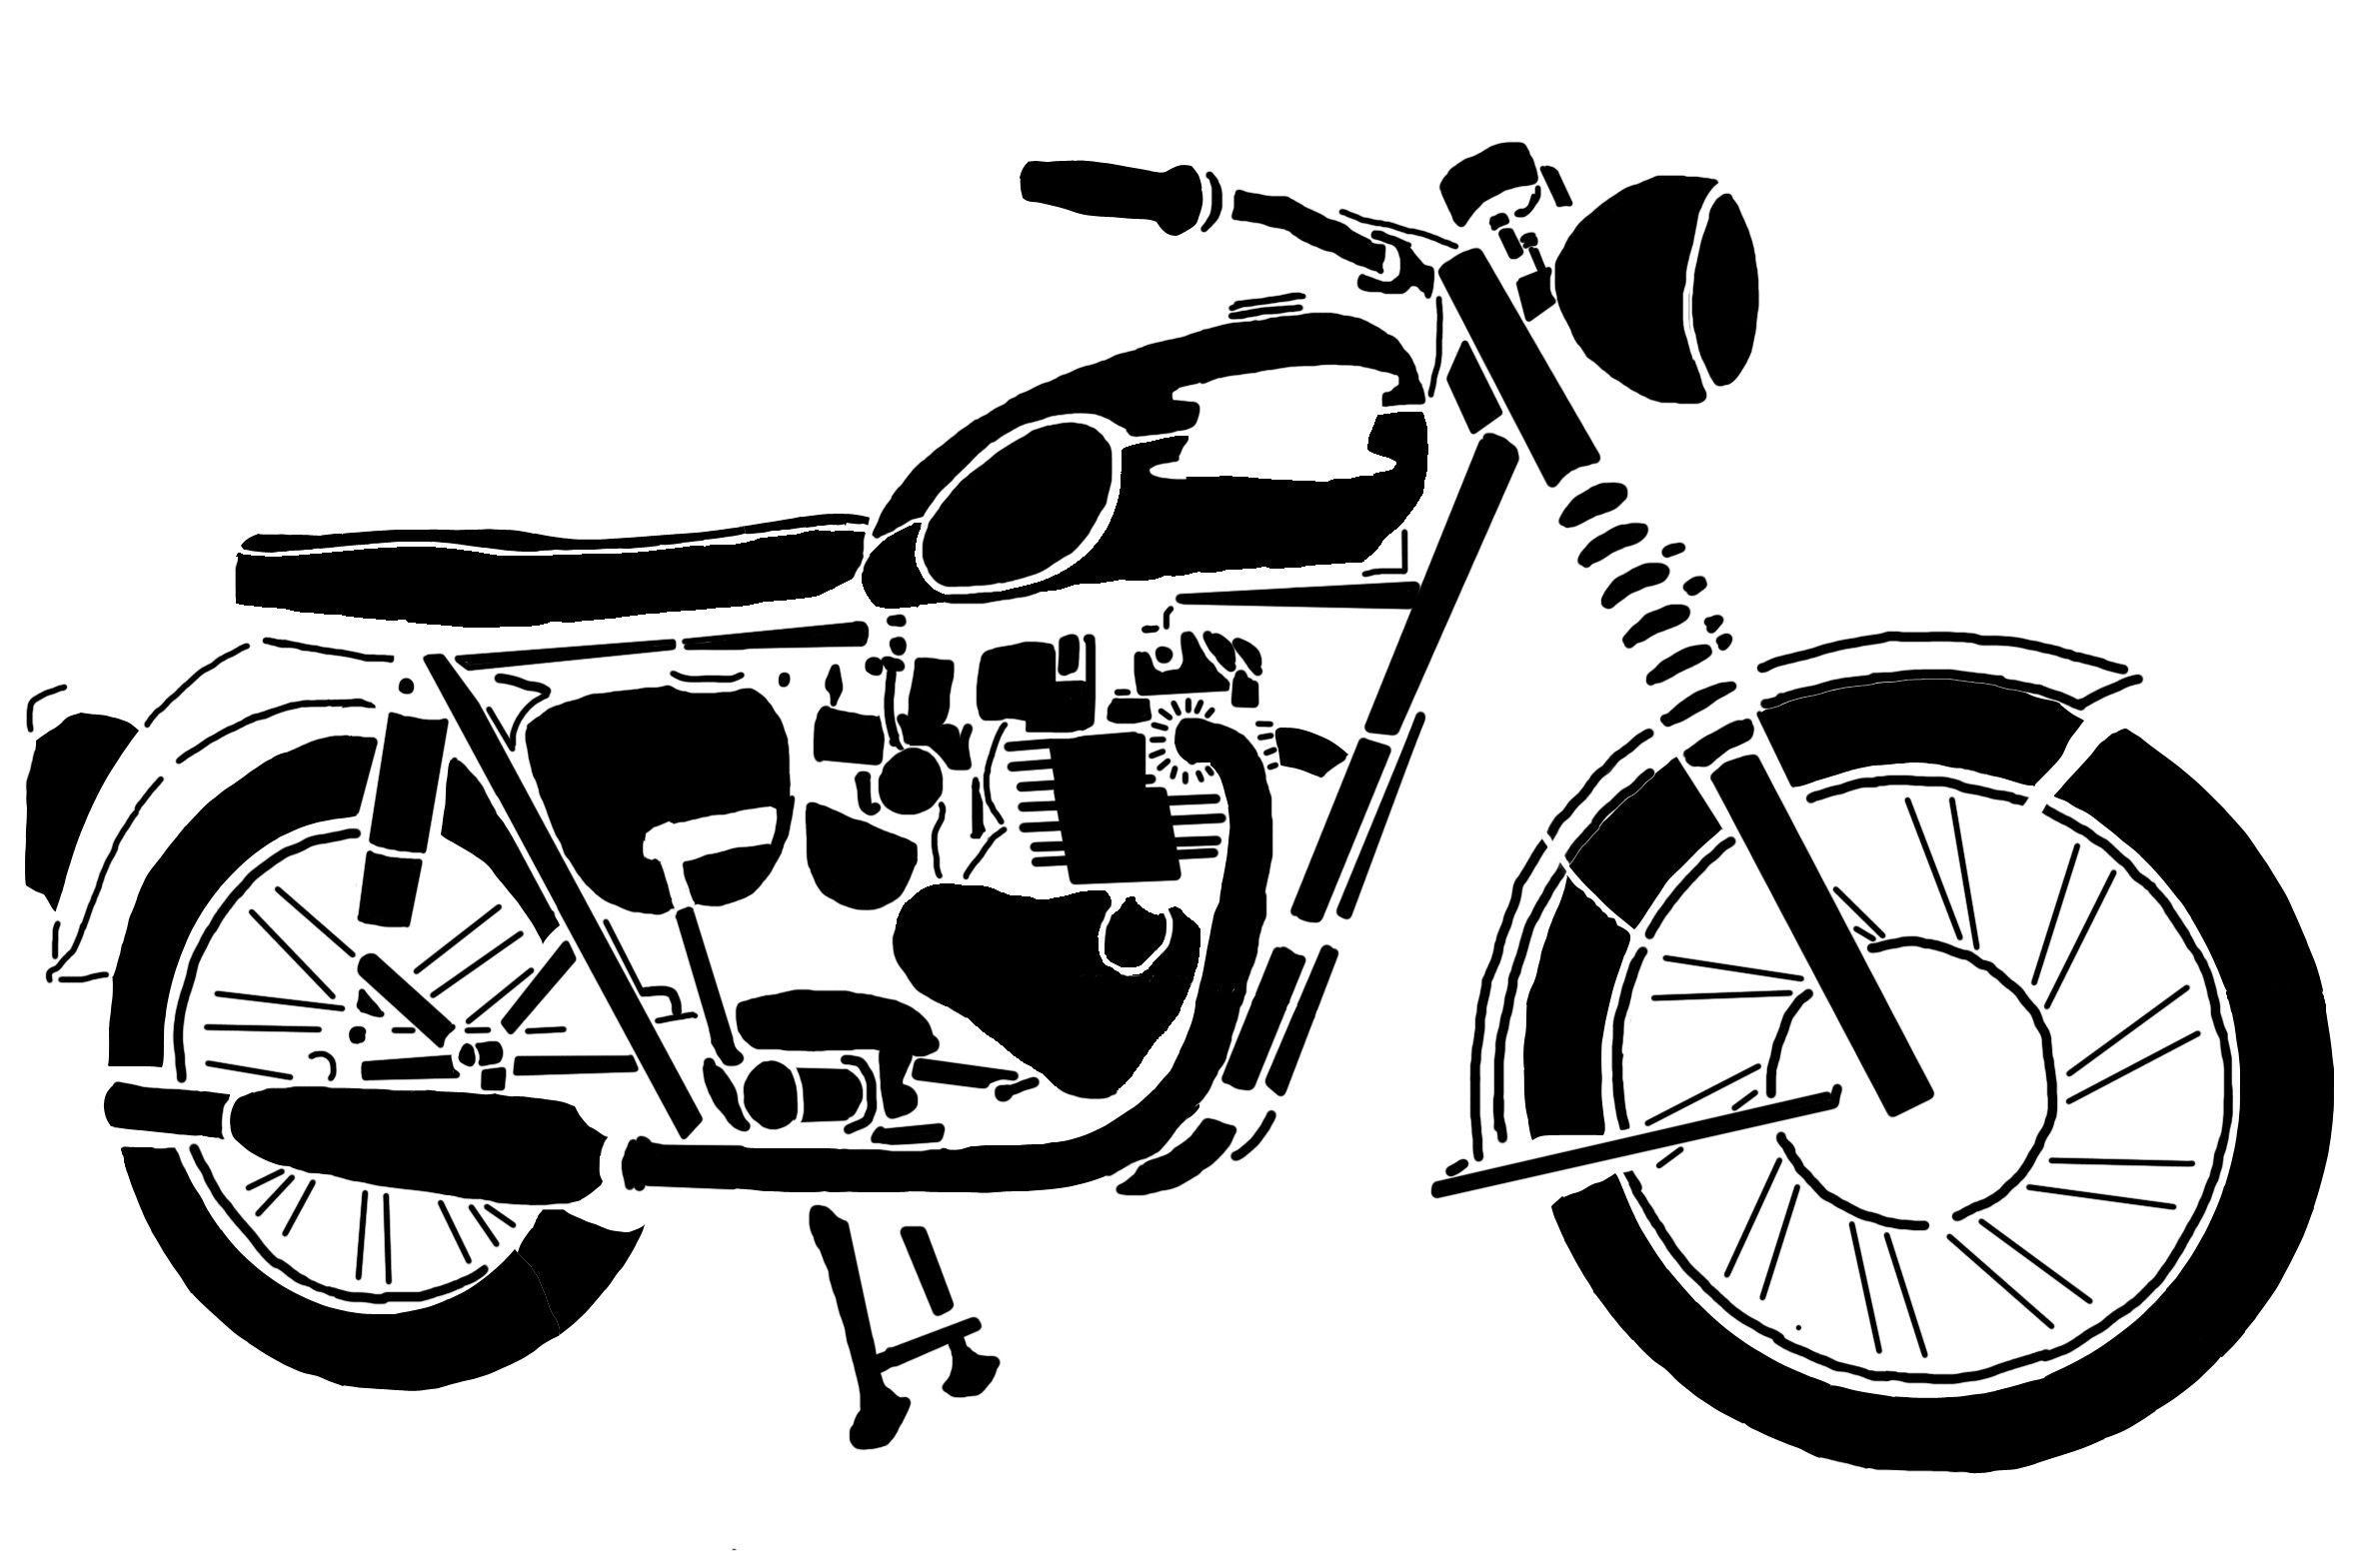 Bonneville stencil projects bikes. Motorcycle clipart triumph motorcycle